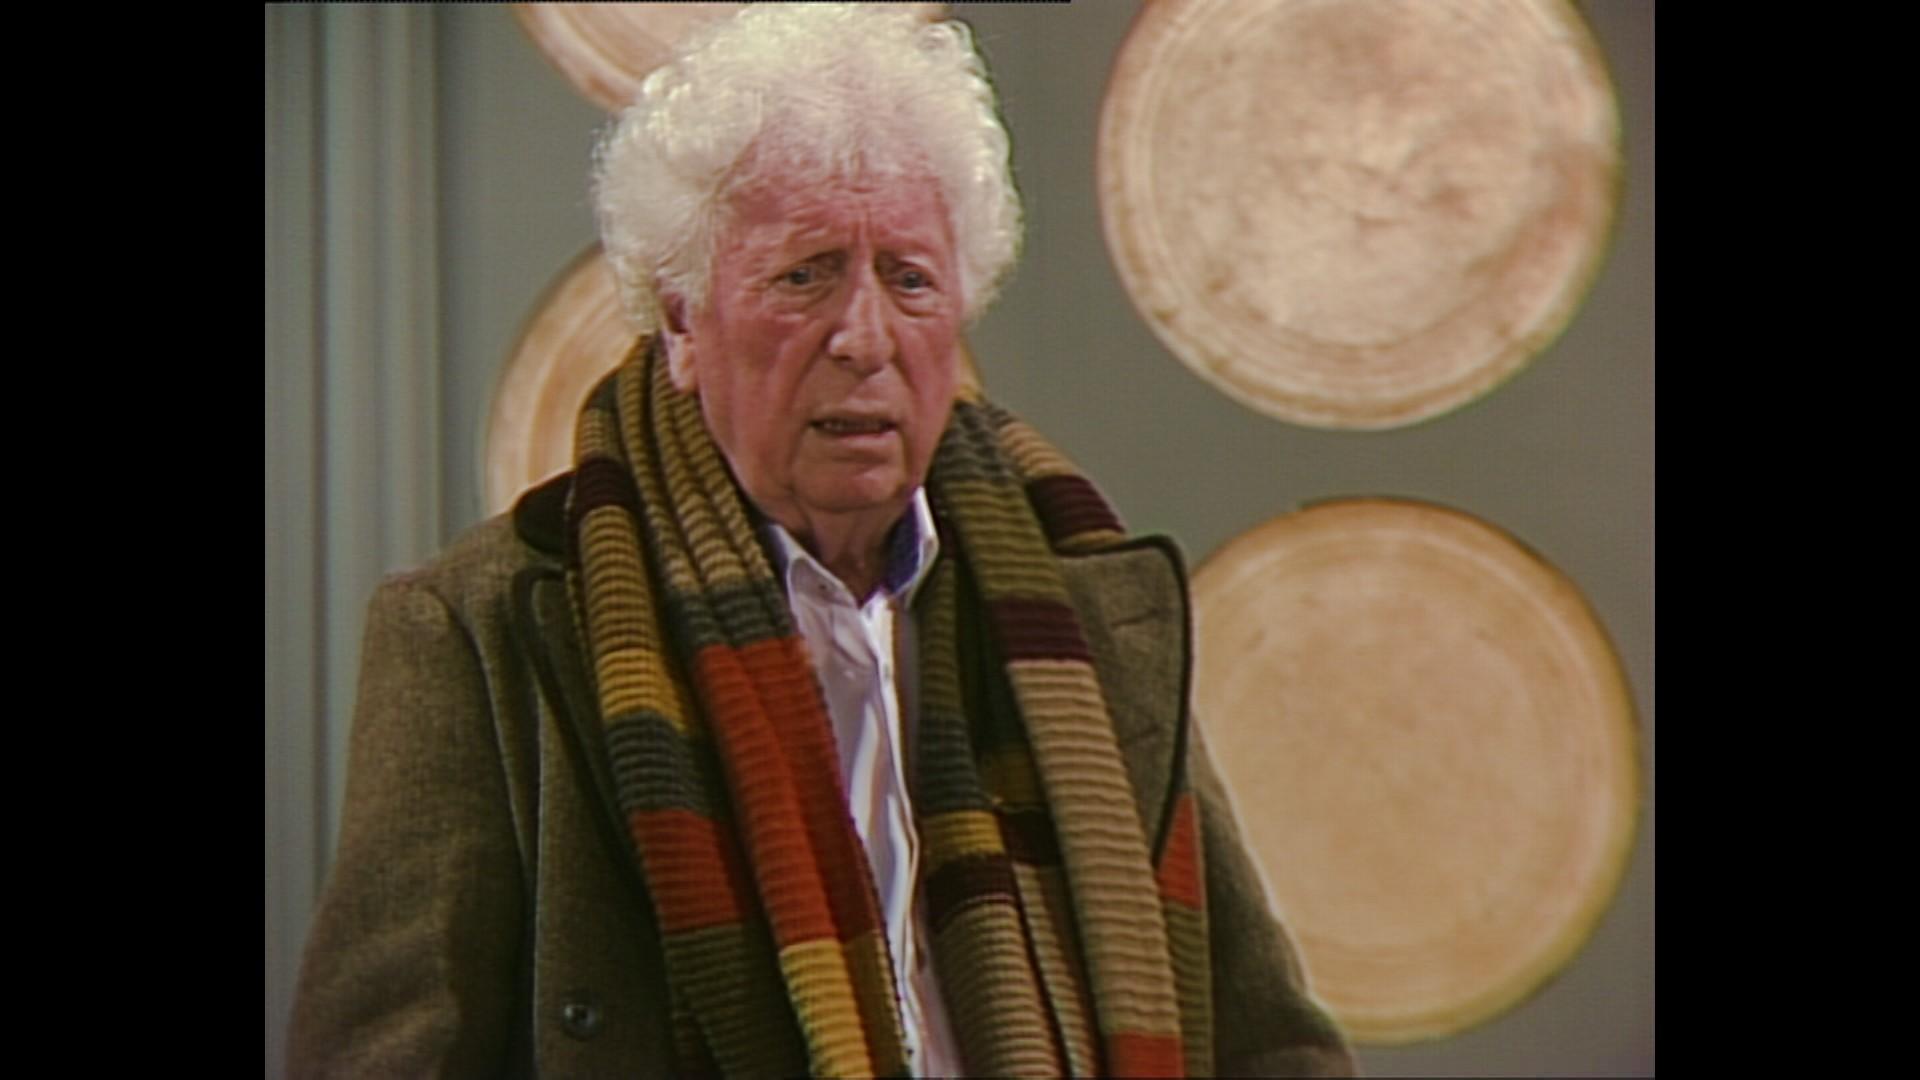 Tom Baker returns for 'lost' episode of Doctor Who